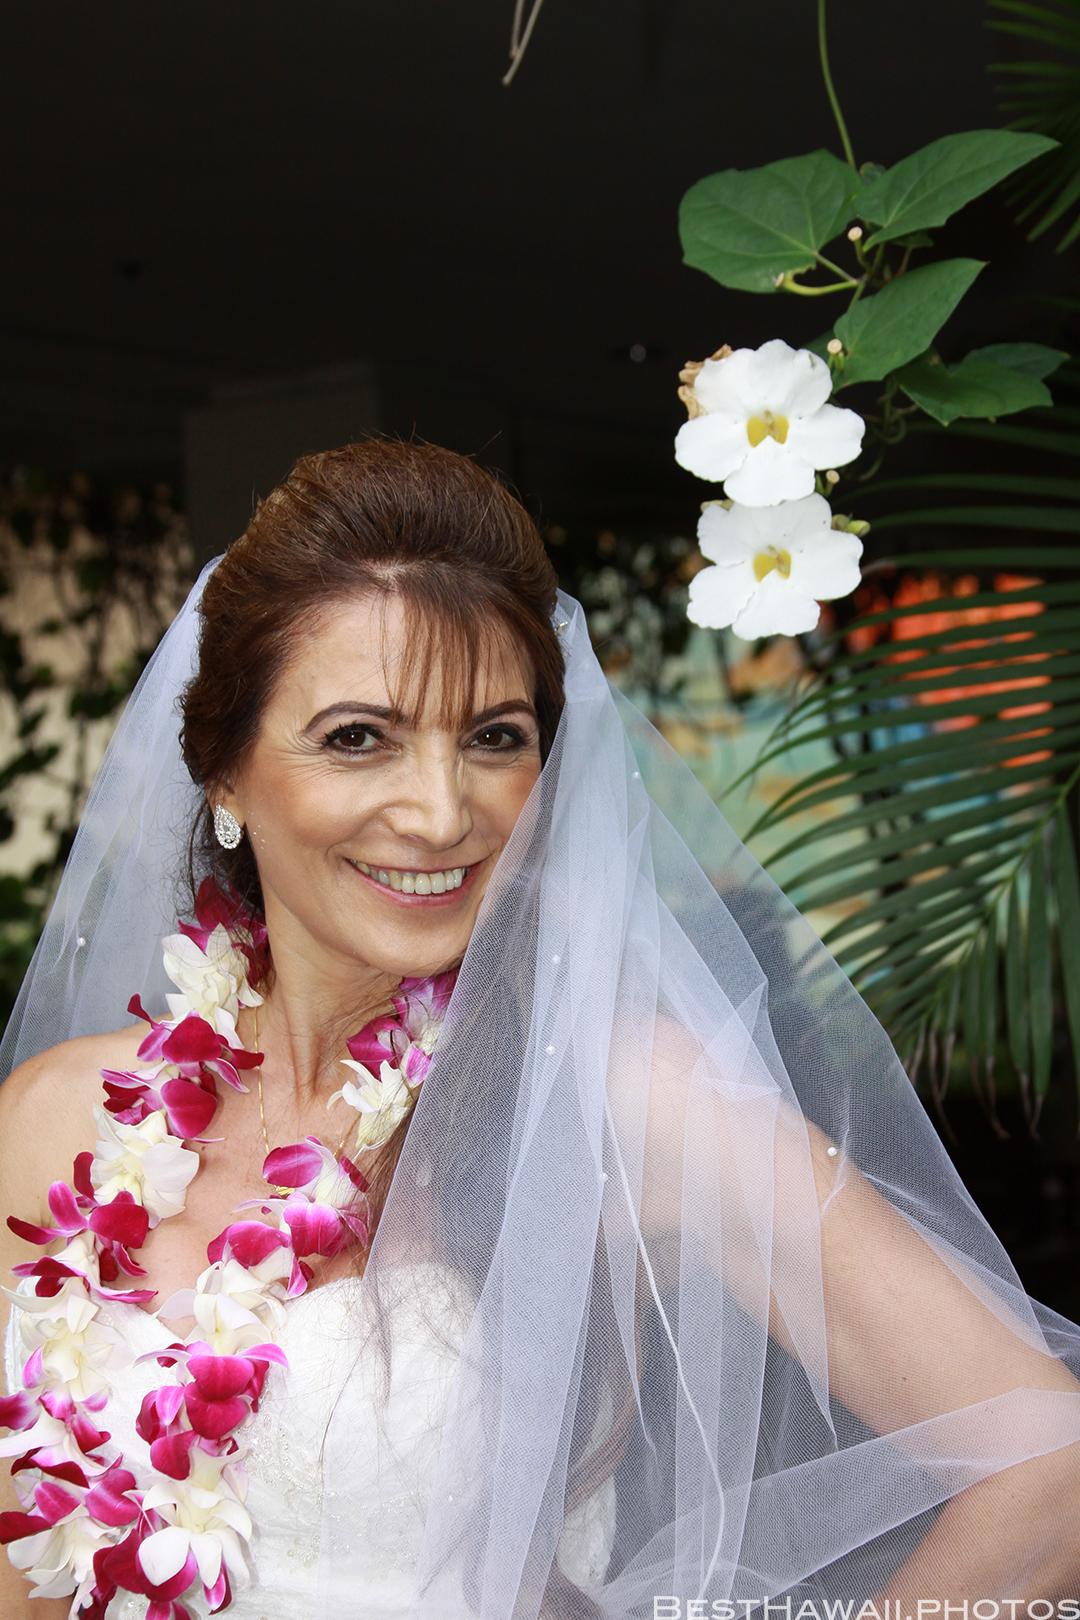 Wedding Photos at Hilton Hawaiian Village by Pasha www.BestHawaii.photos 121820158648